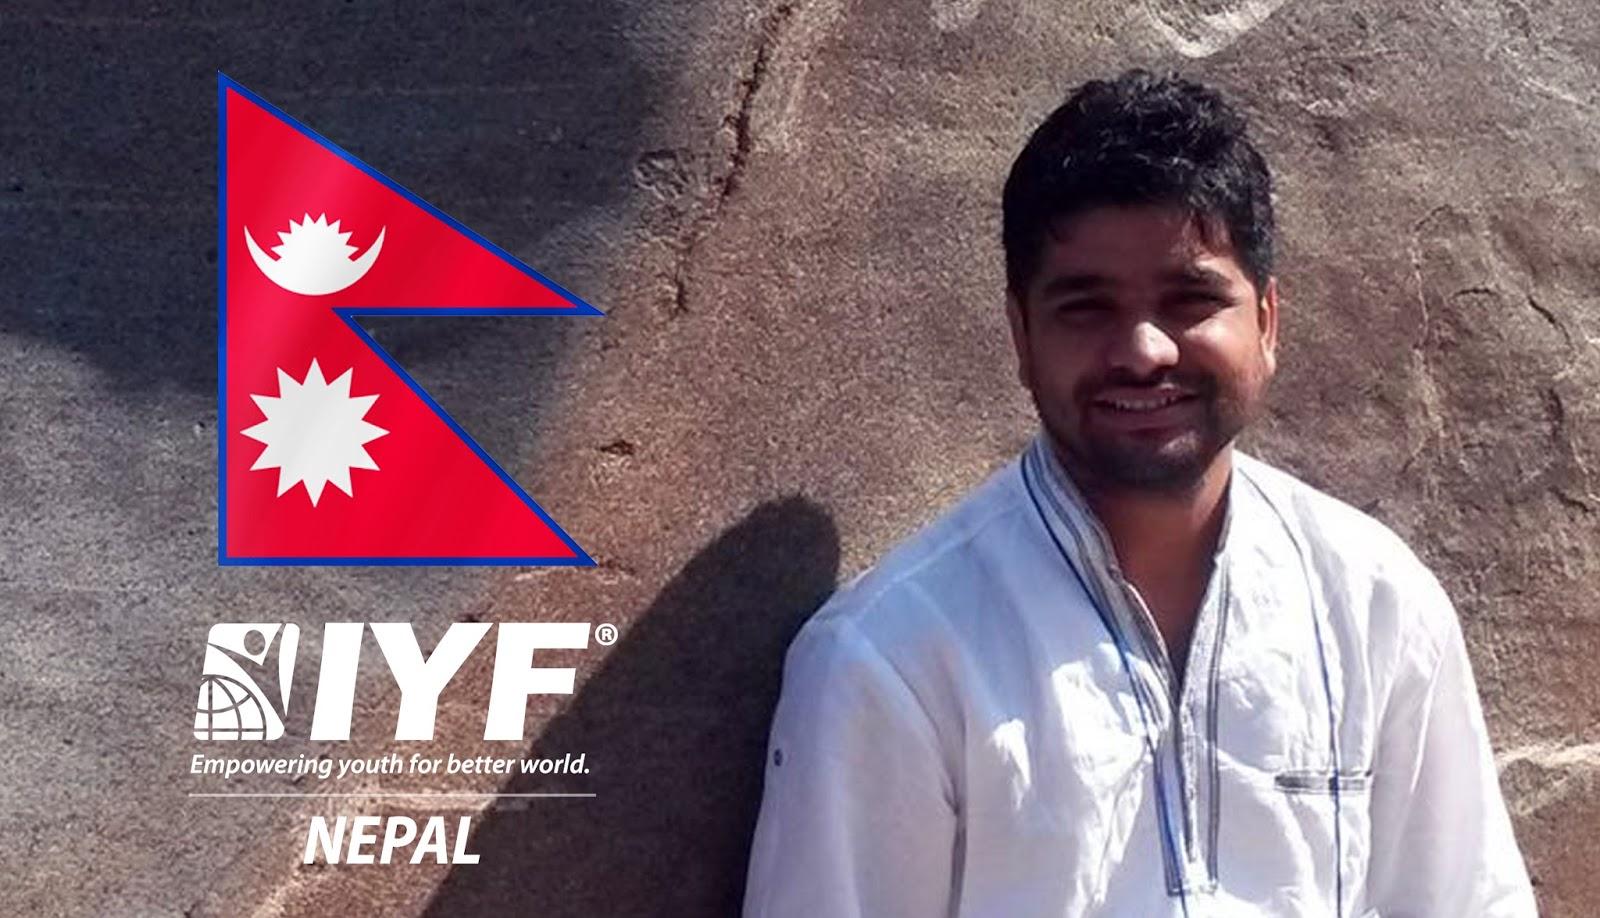 Deepak Bashyal, IYF Representative in Nepal